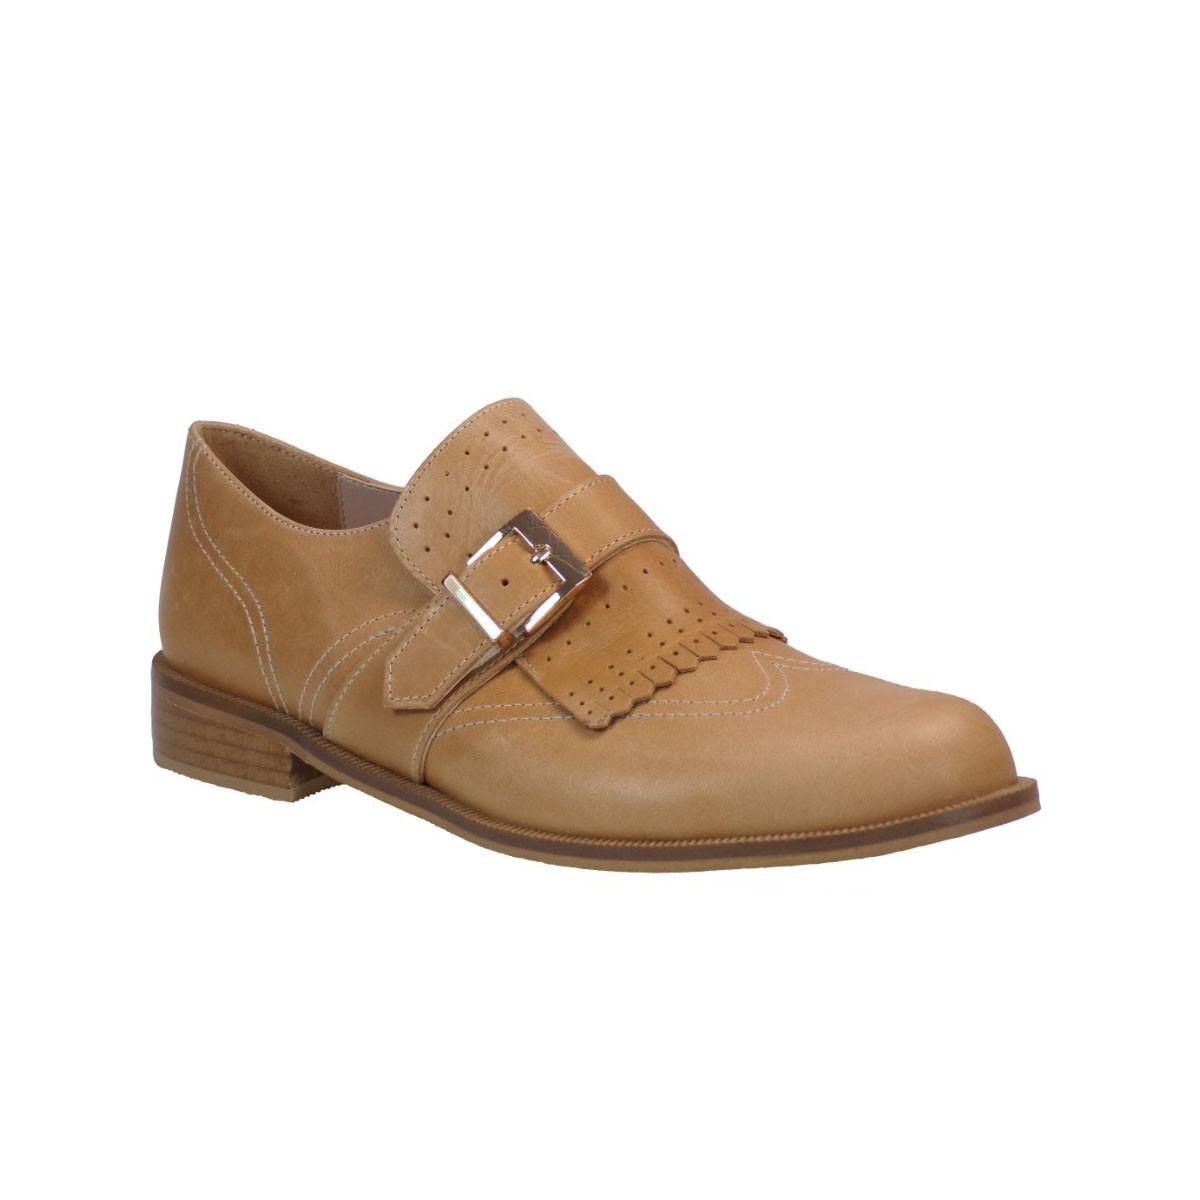 4defe99f7c9 Moods Oxford Παπούτσια Γυναικεία 5840 Ταμπά